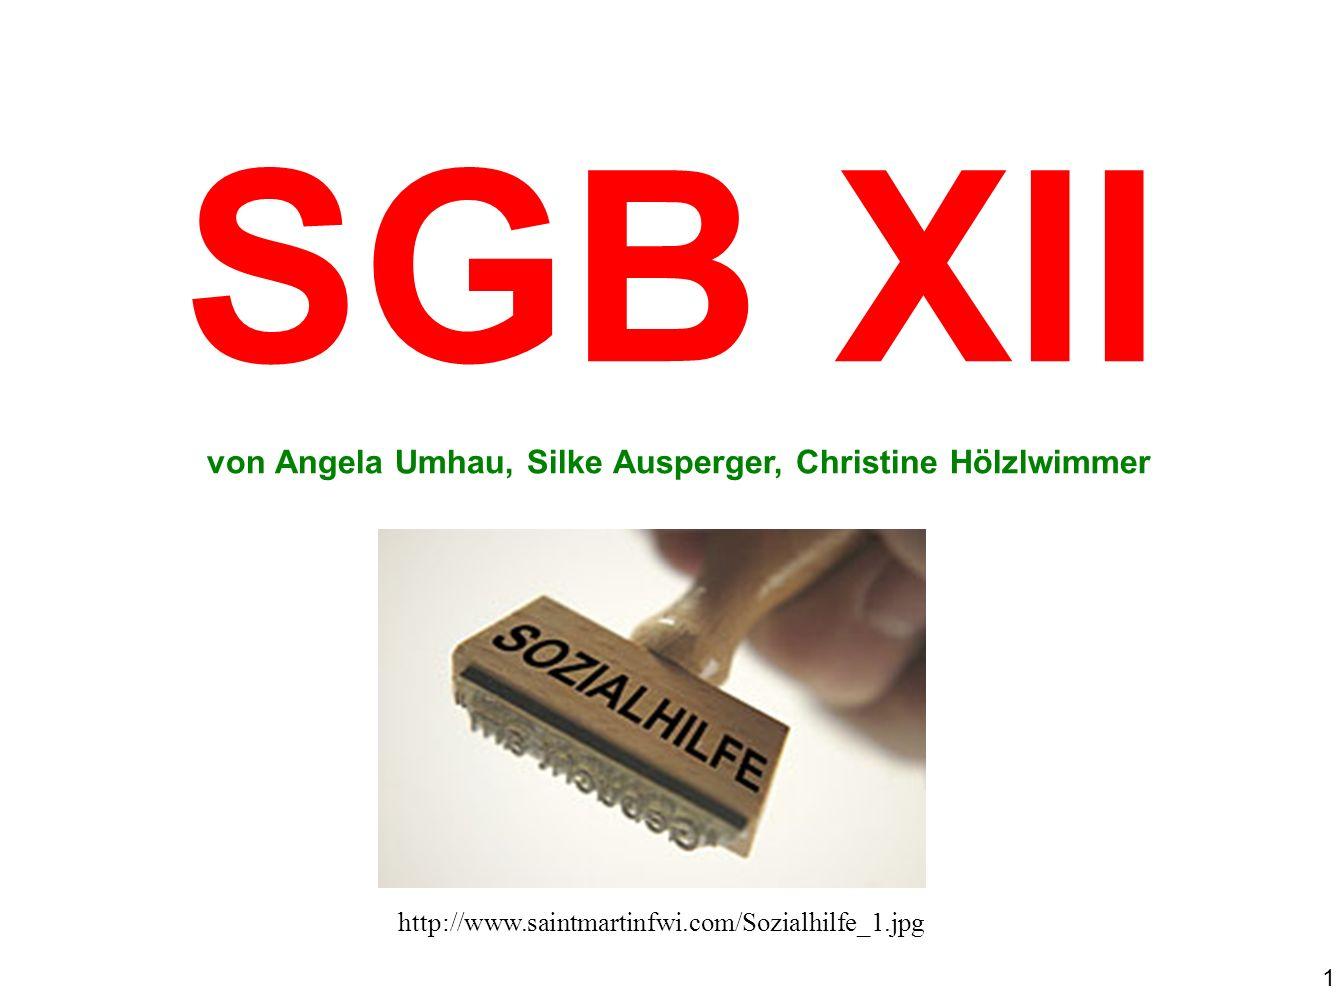 1 SGB XII von Angela Umhau, Silke Ausperger, Christine Hölzlwimmer http://www.saintmartinfwi.com/Sozialhilfe_1.jpg